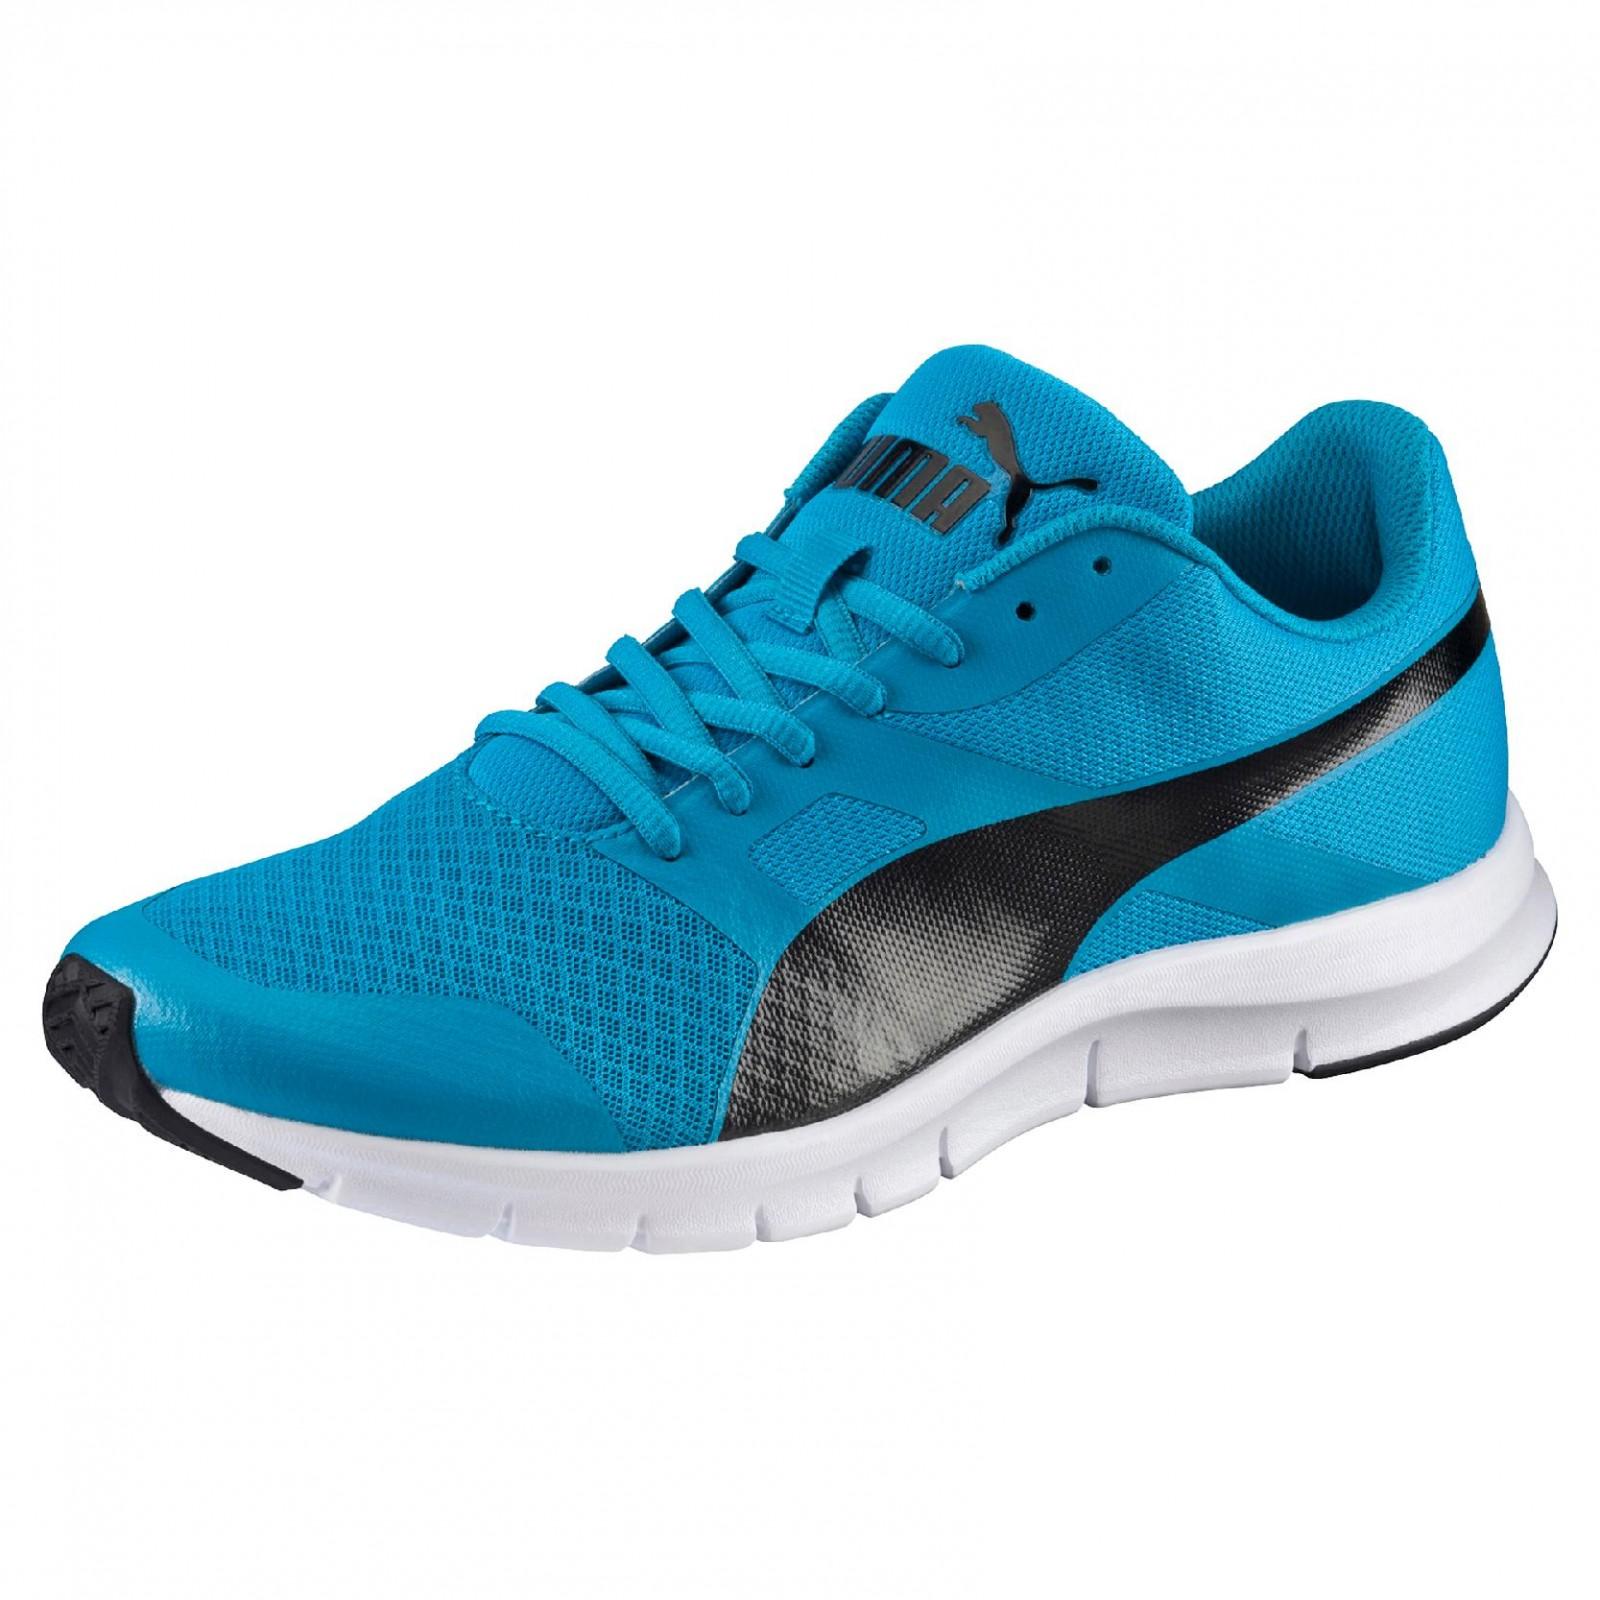 Pánské běžecké boty Puma Flexracer atomic blue-black  edaa6f369a